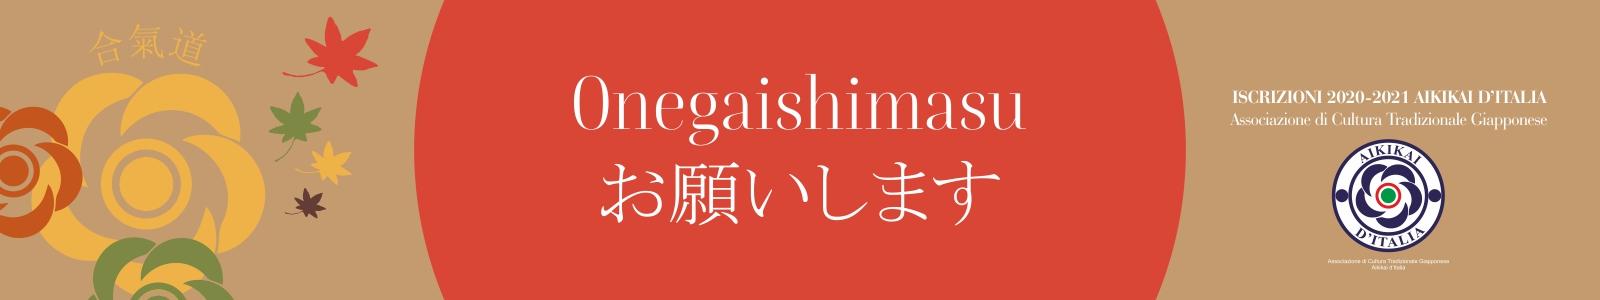 iscrizioni-aikikai-2020-2021-a15